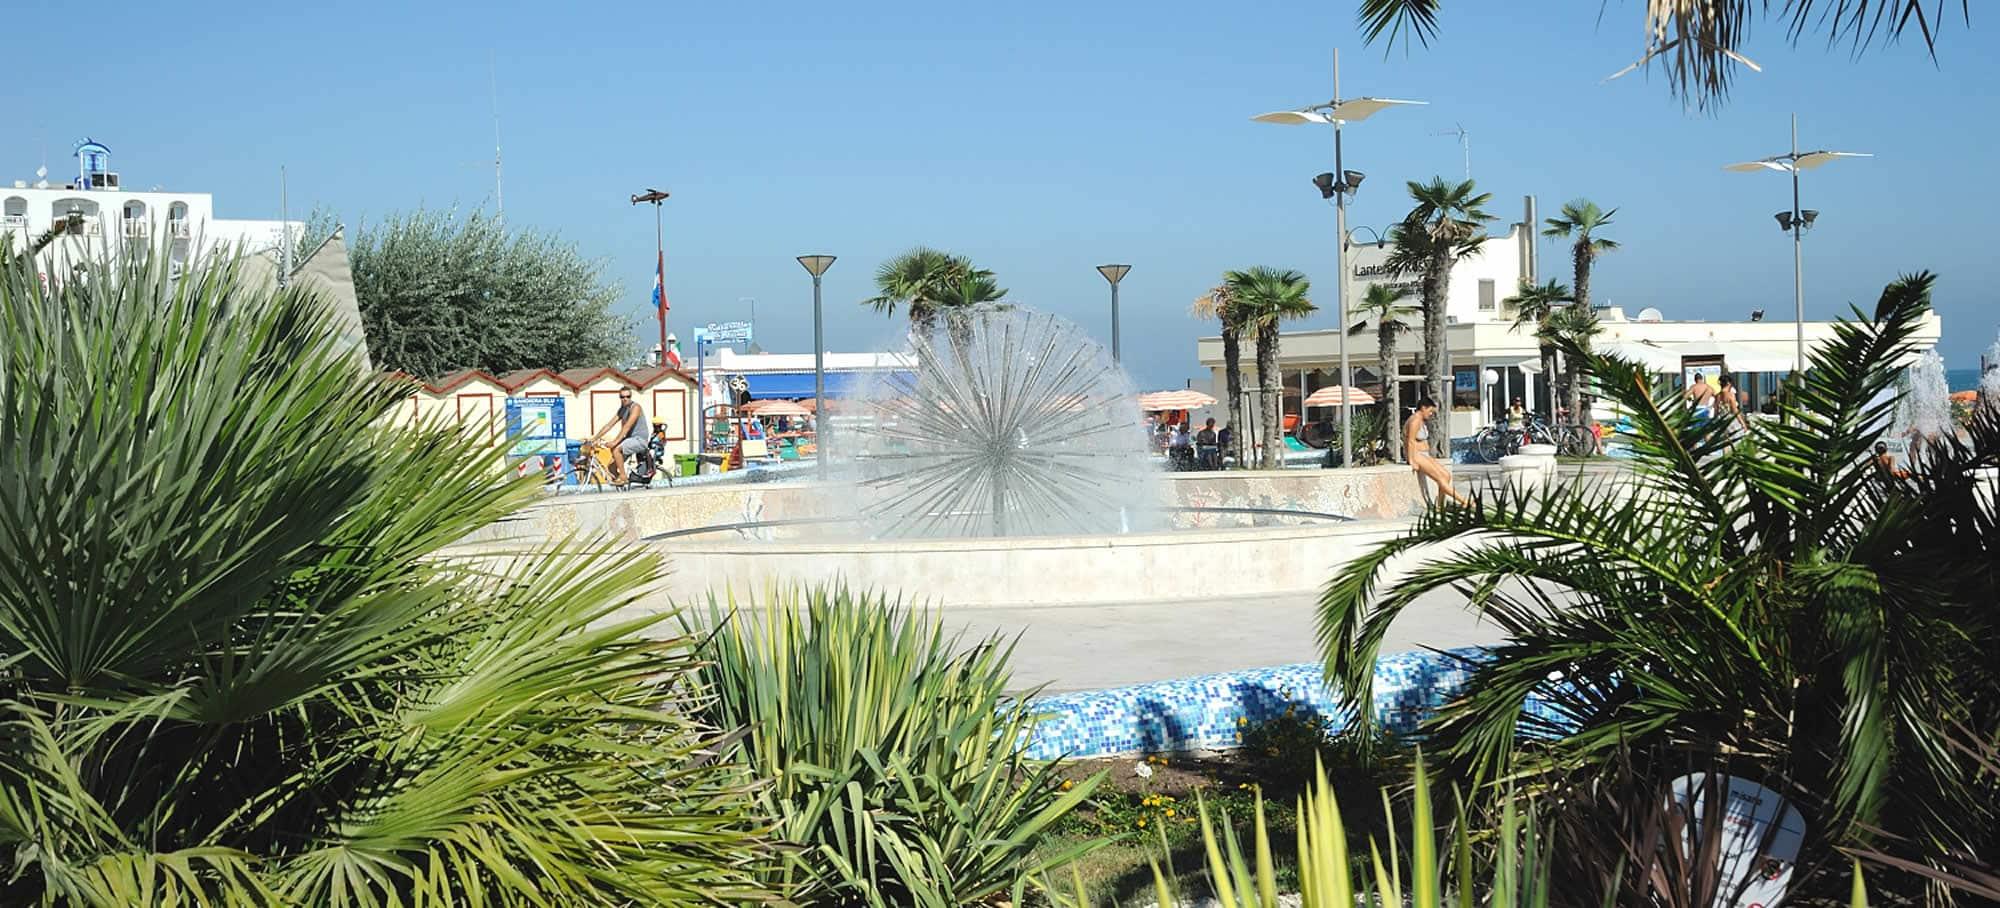 Family Hotels in Misano Adriatico